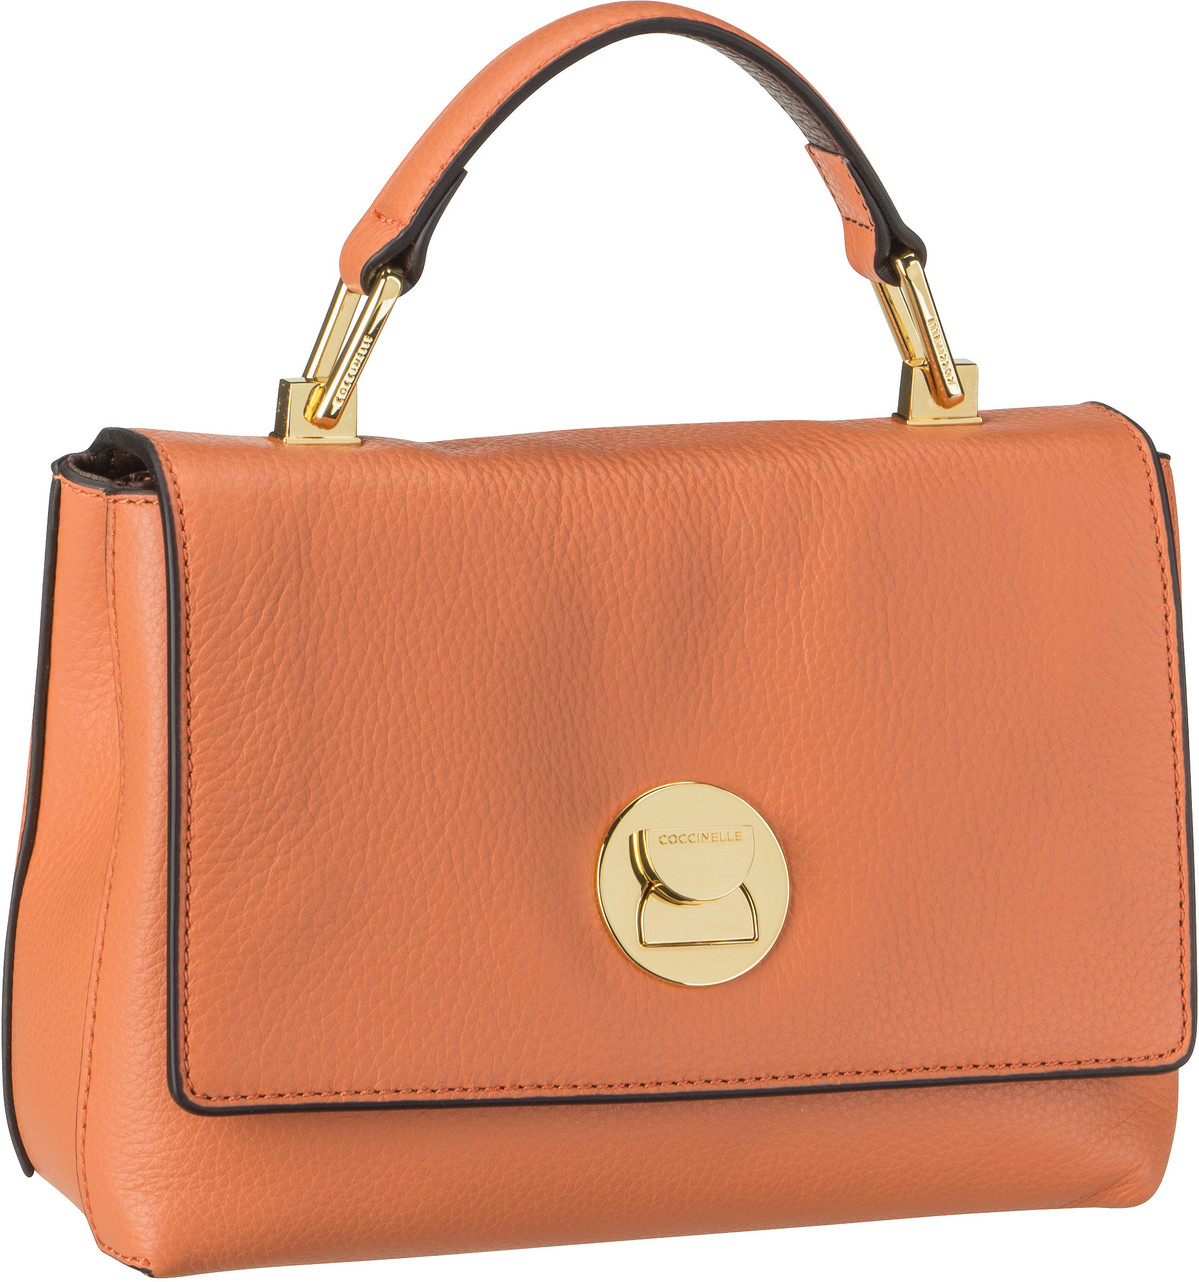 Handtasche Liya 5840 Peach/Chocolate